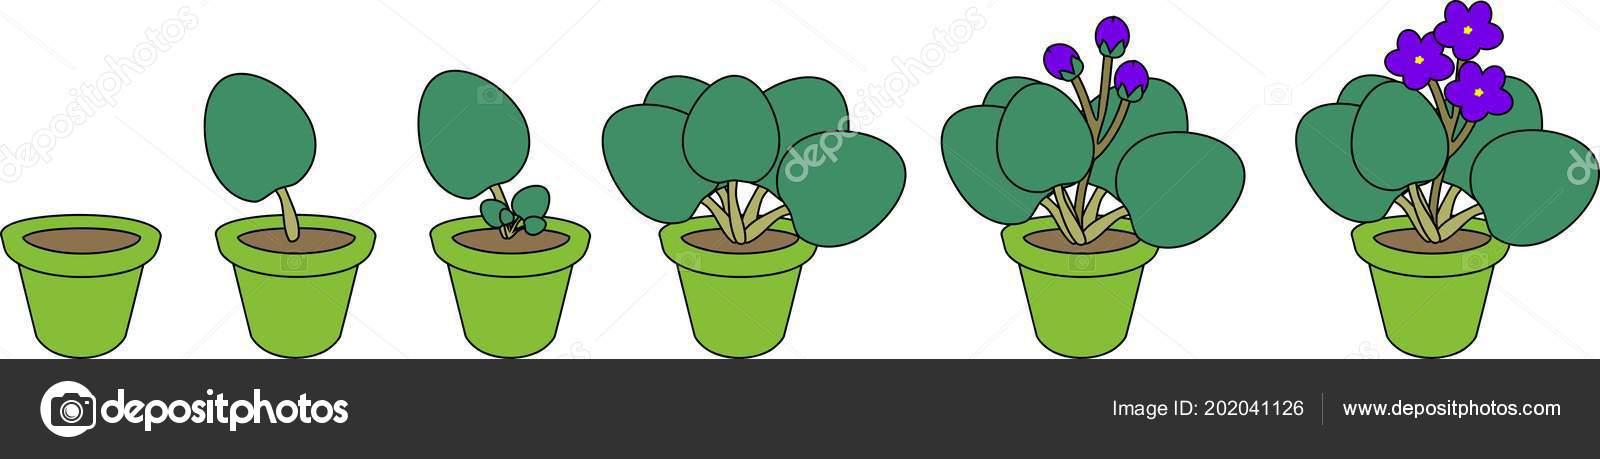 vegetativa propagation Multiplicacion asexual